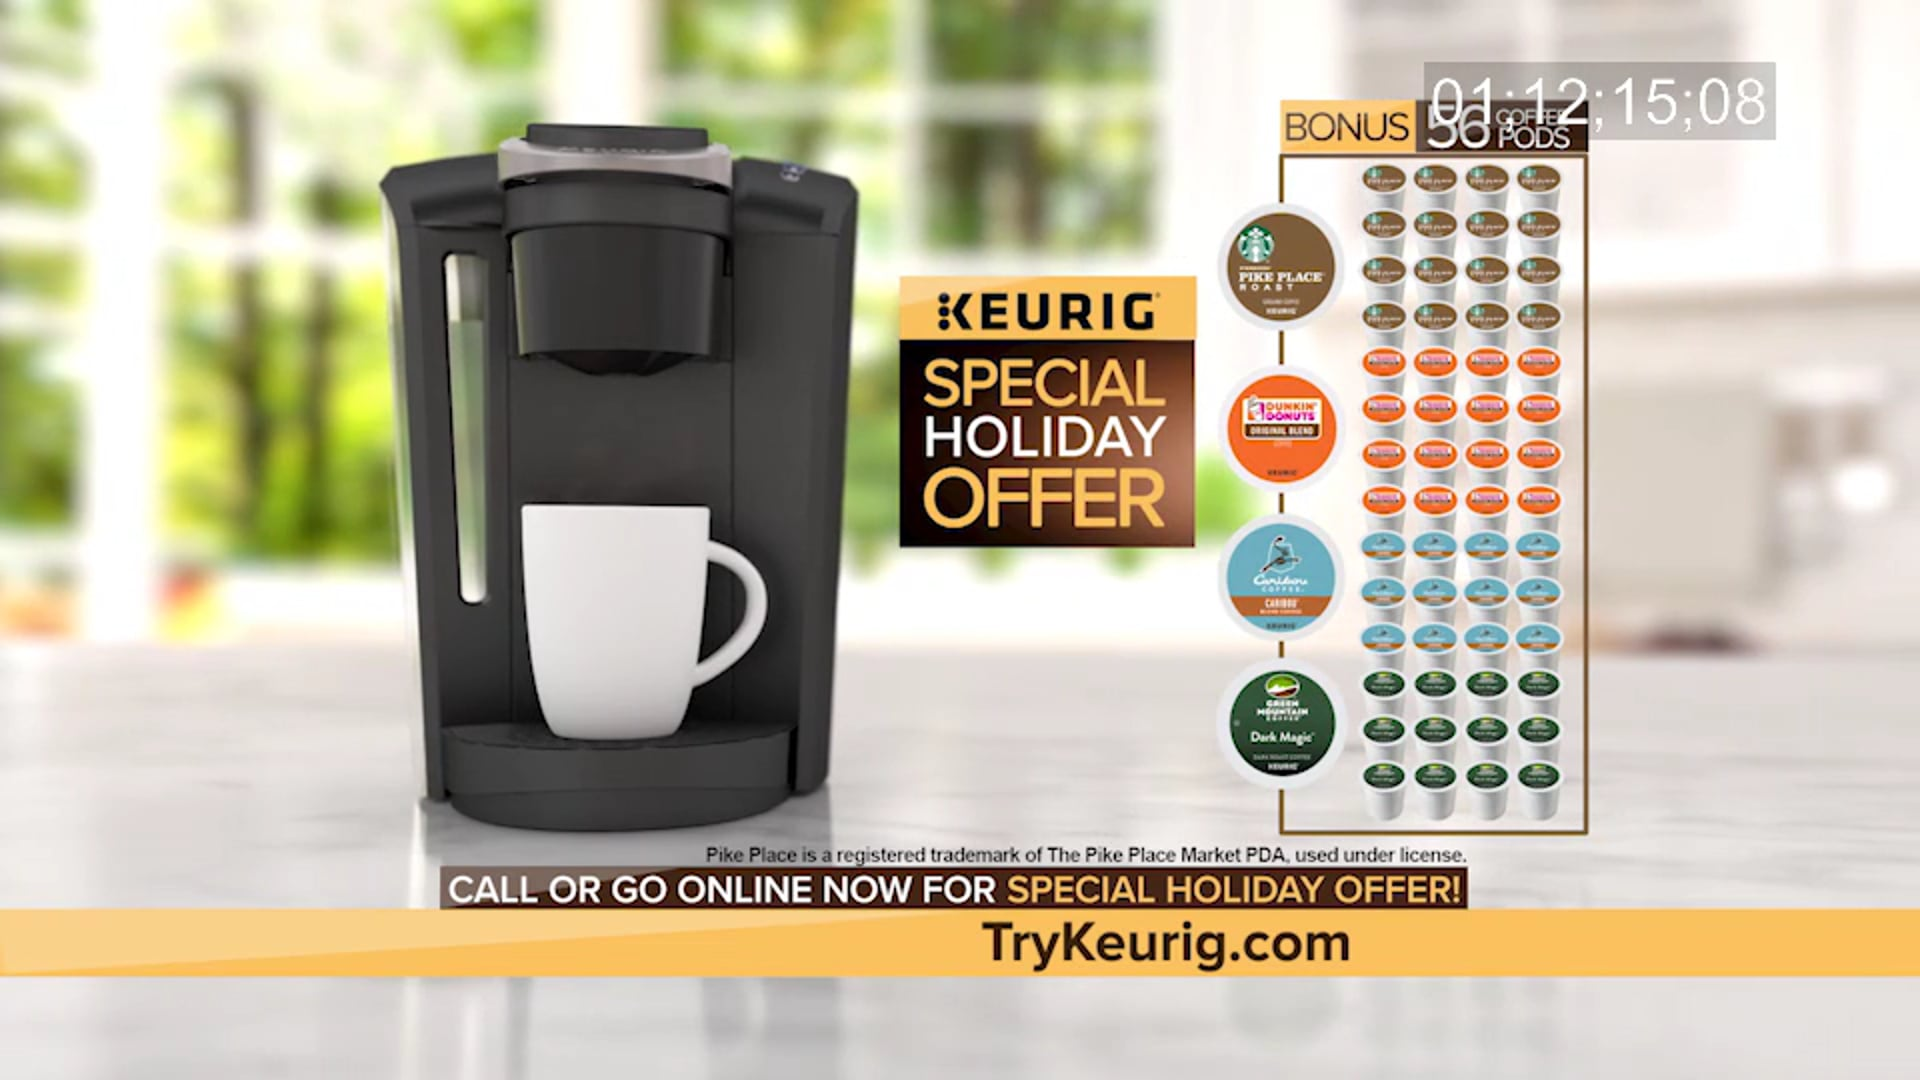 Keurig Coffee Maker Direct Response Show